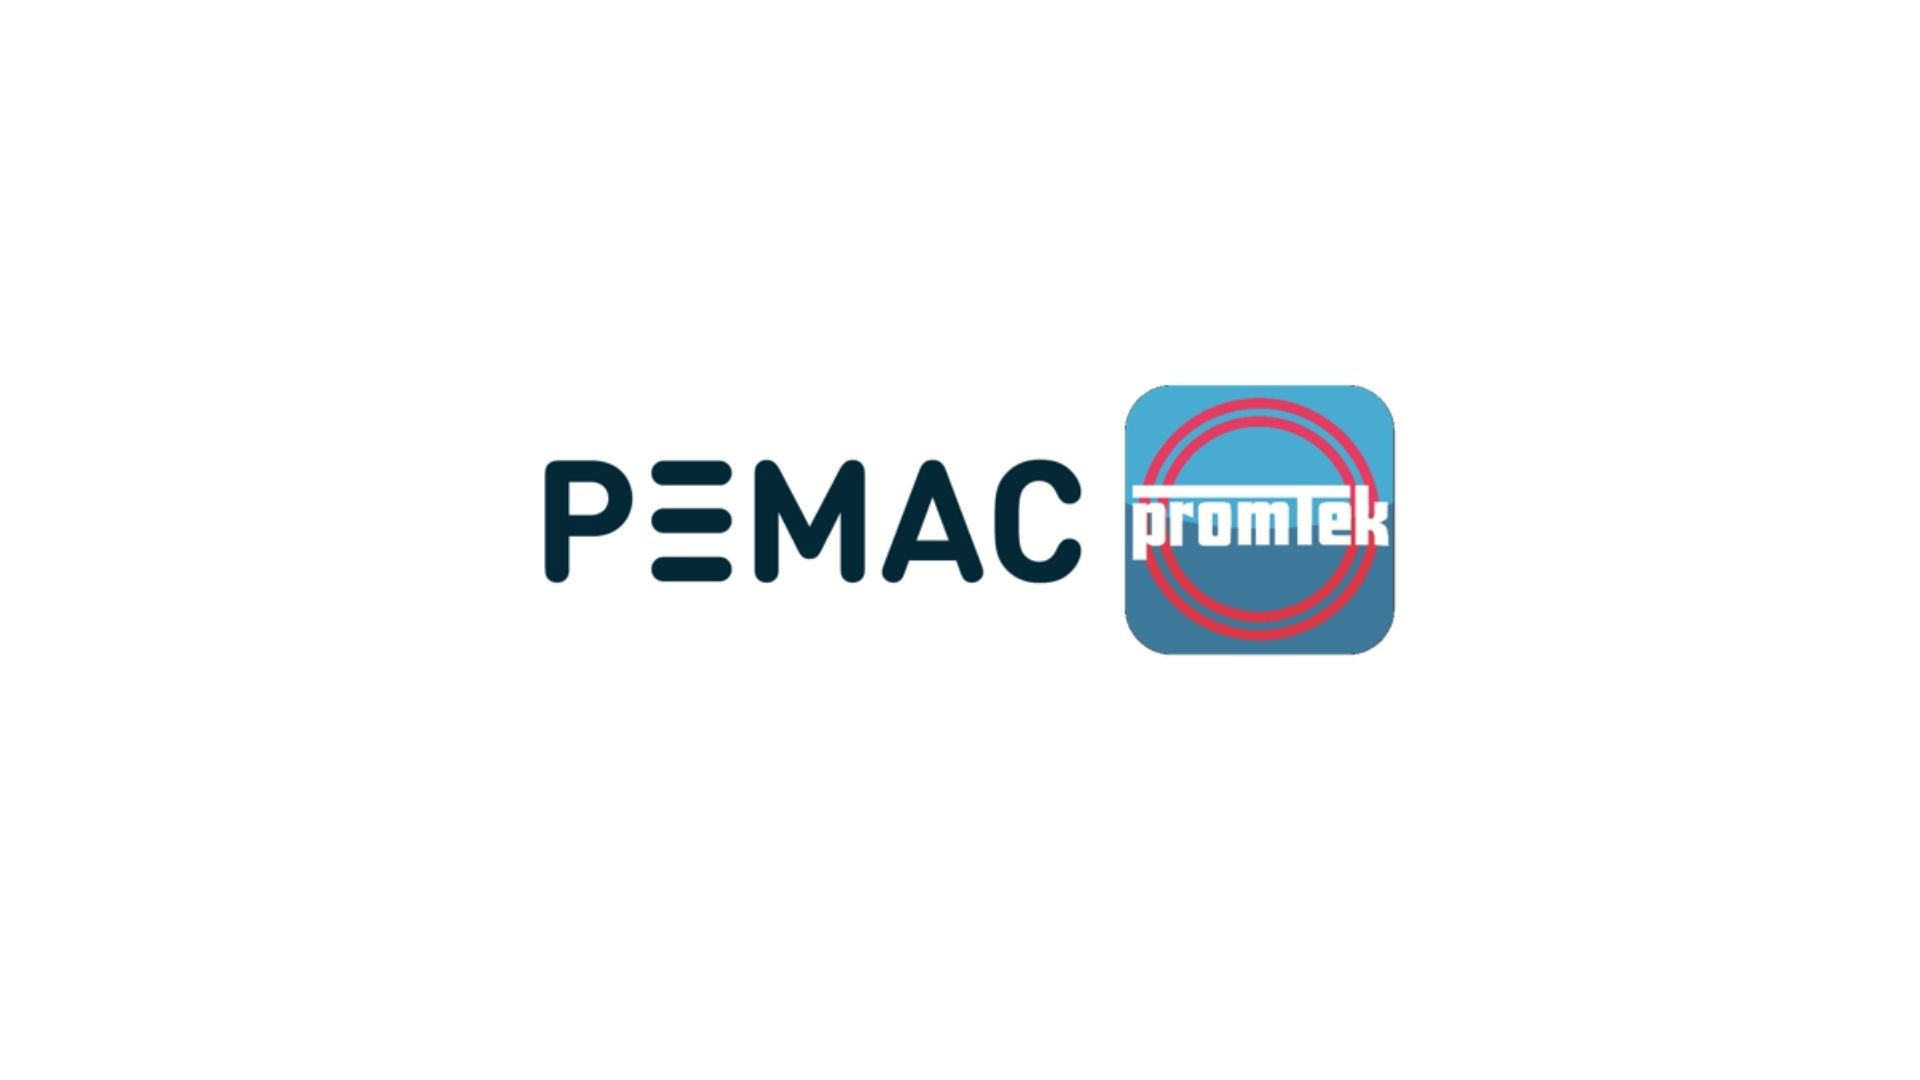 PEMAC partner with Promtek